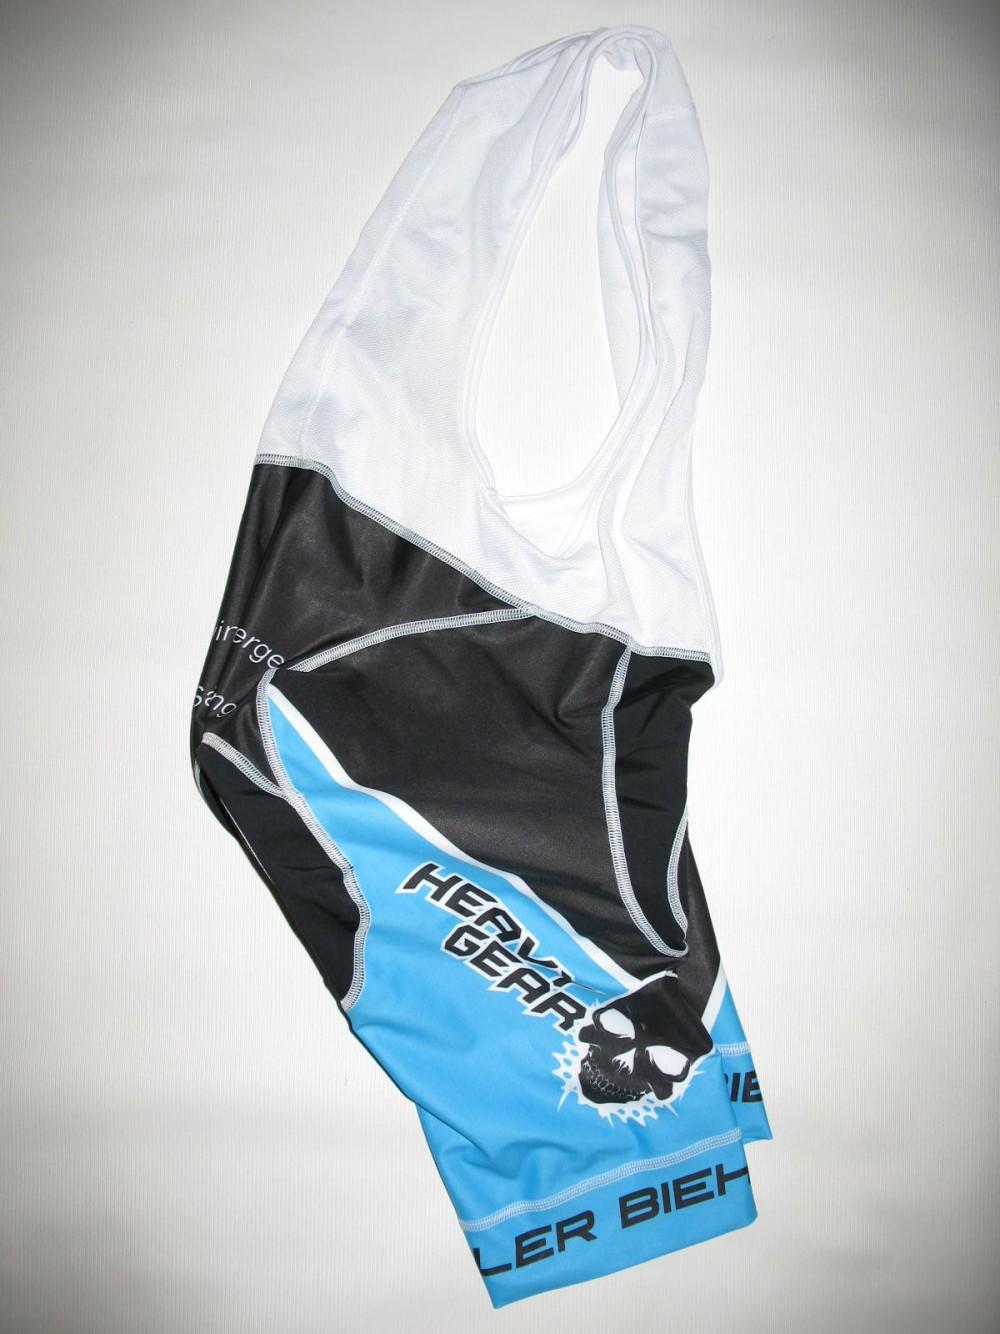 Велошорты BIEHLER heavy gear bib cycling shorts (размер S) - 3